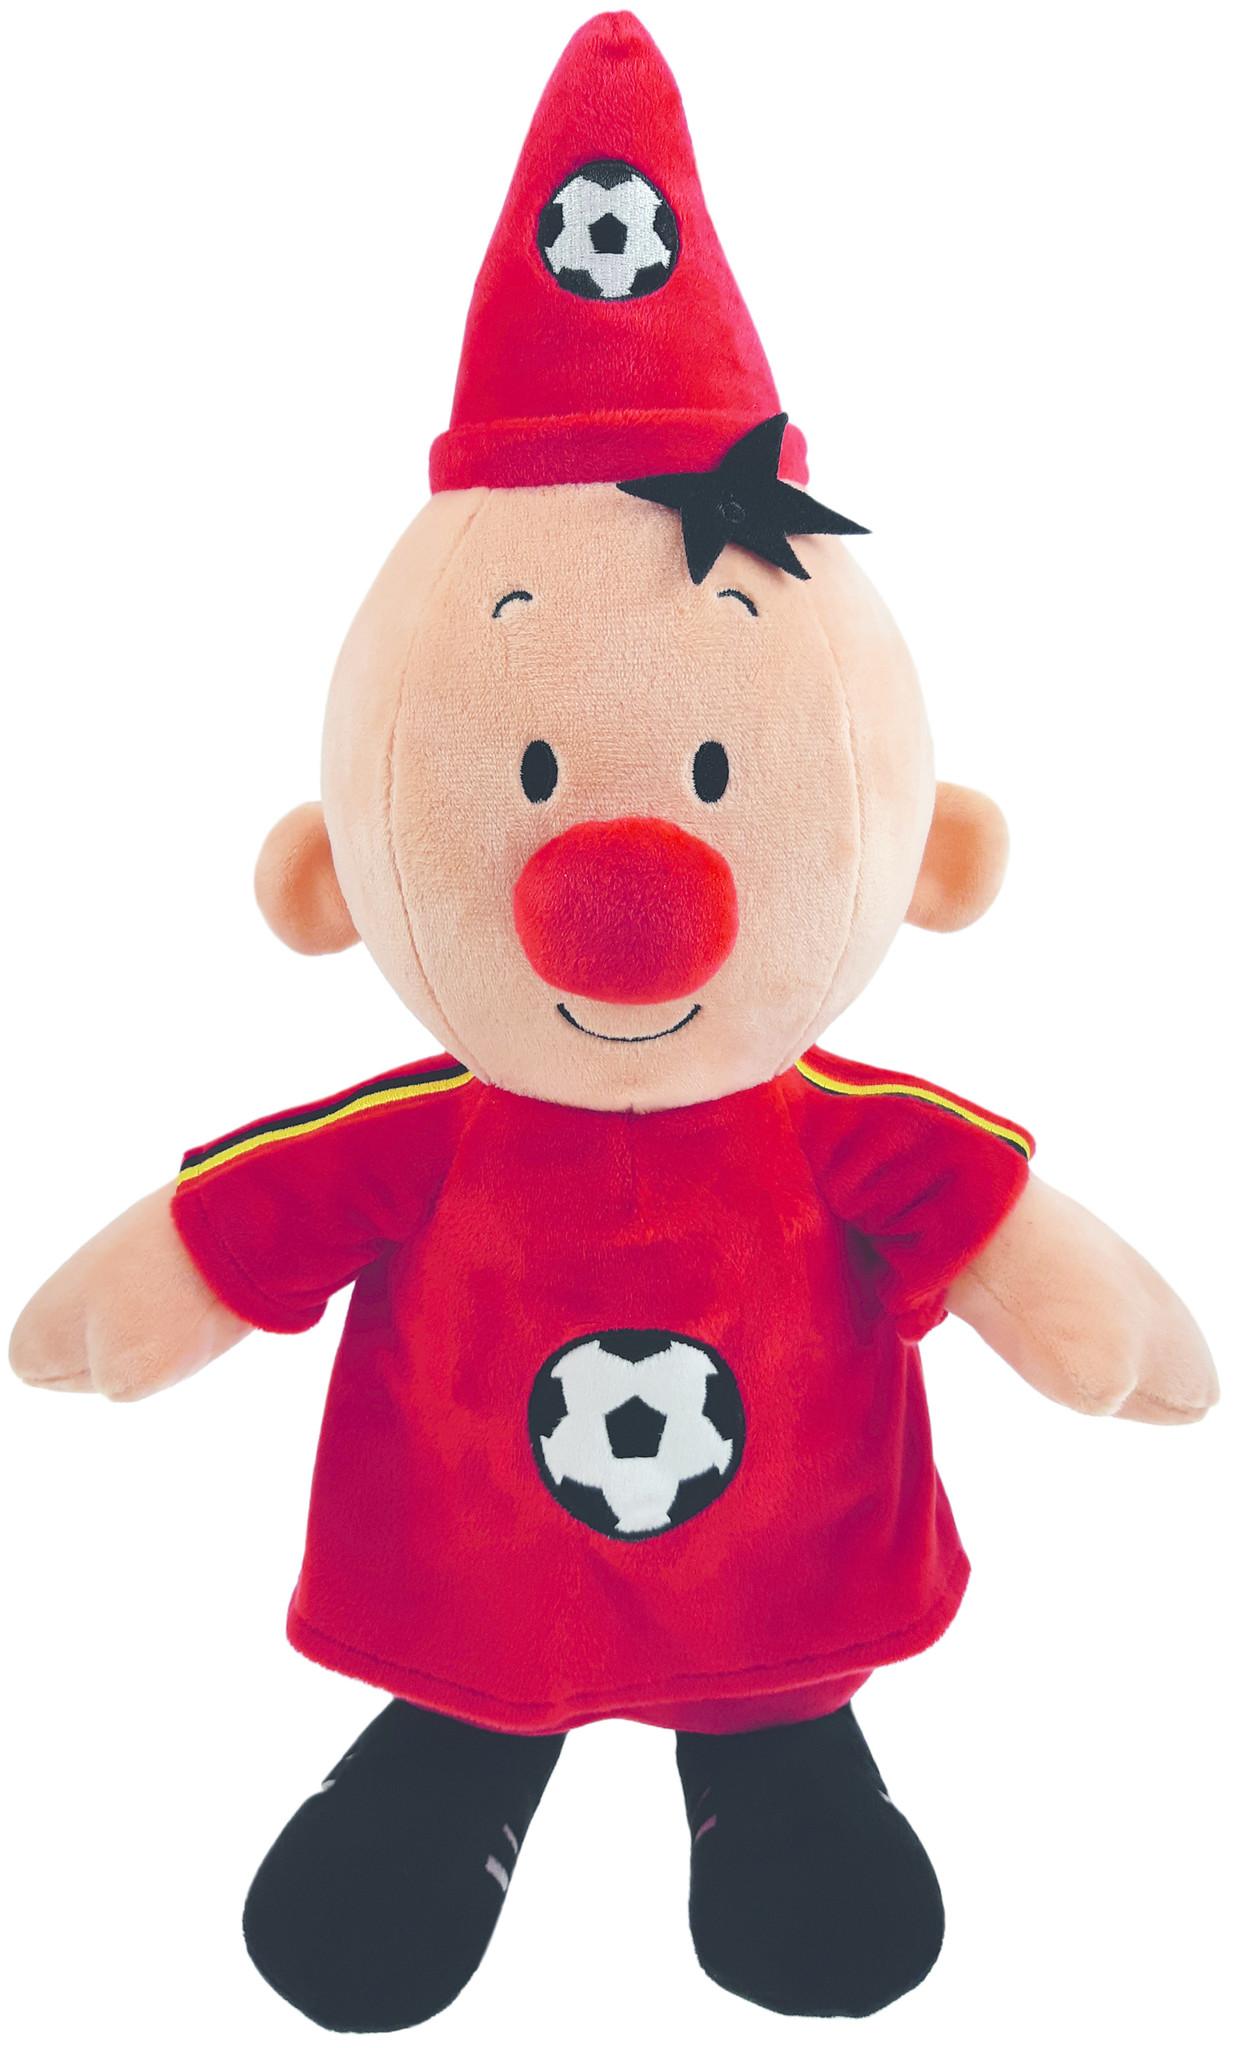 Bumba pluche: voetballer België 40 cm